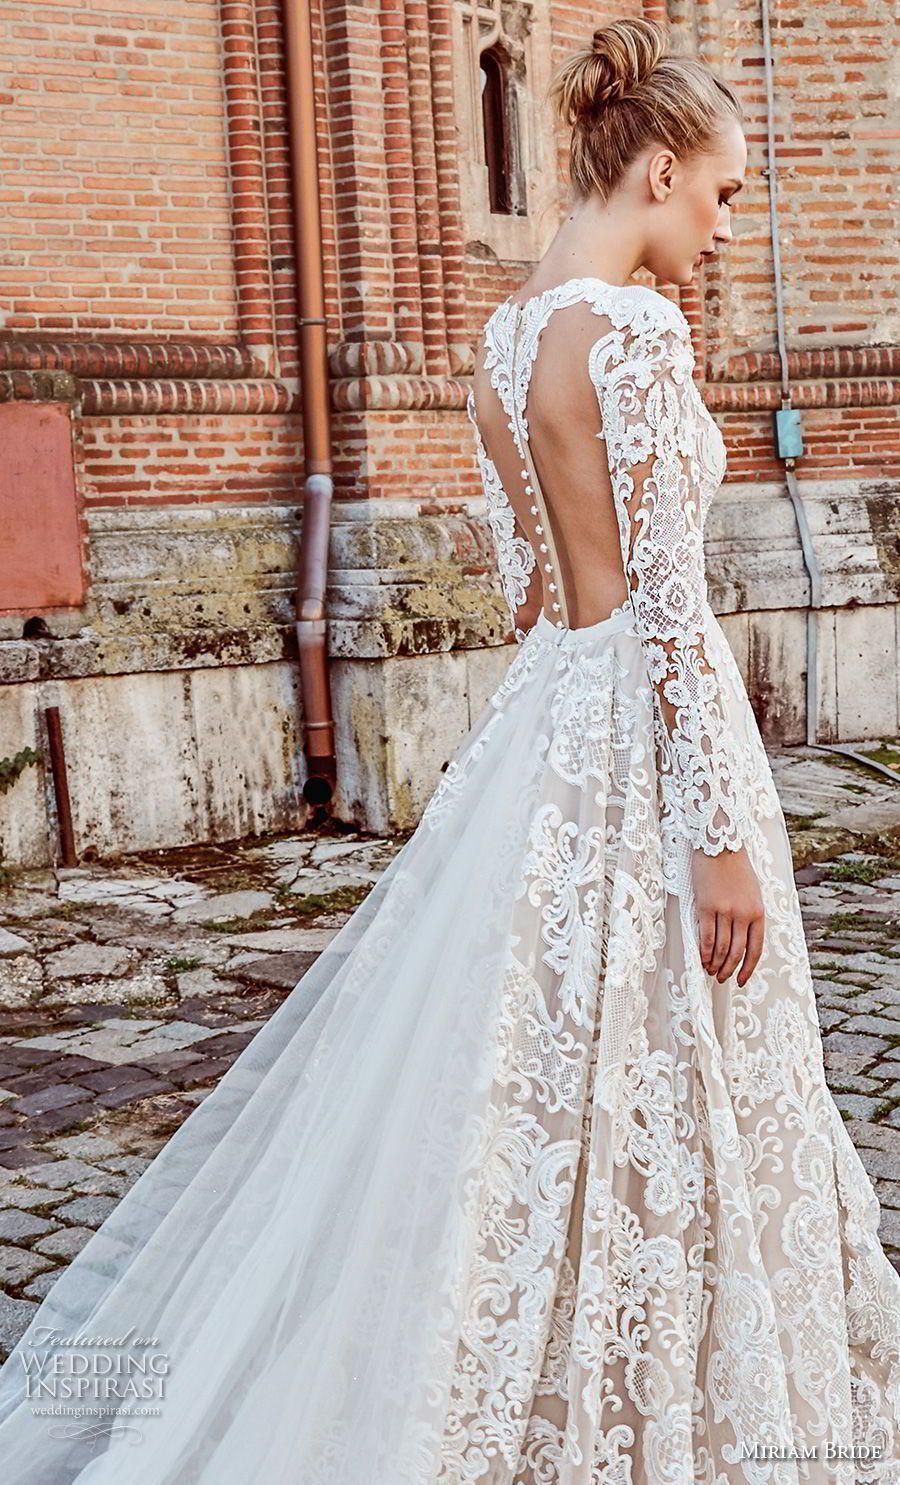 Miriams bride bridal long sleeves deep v neck full